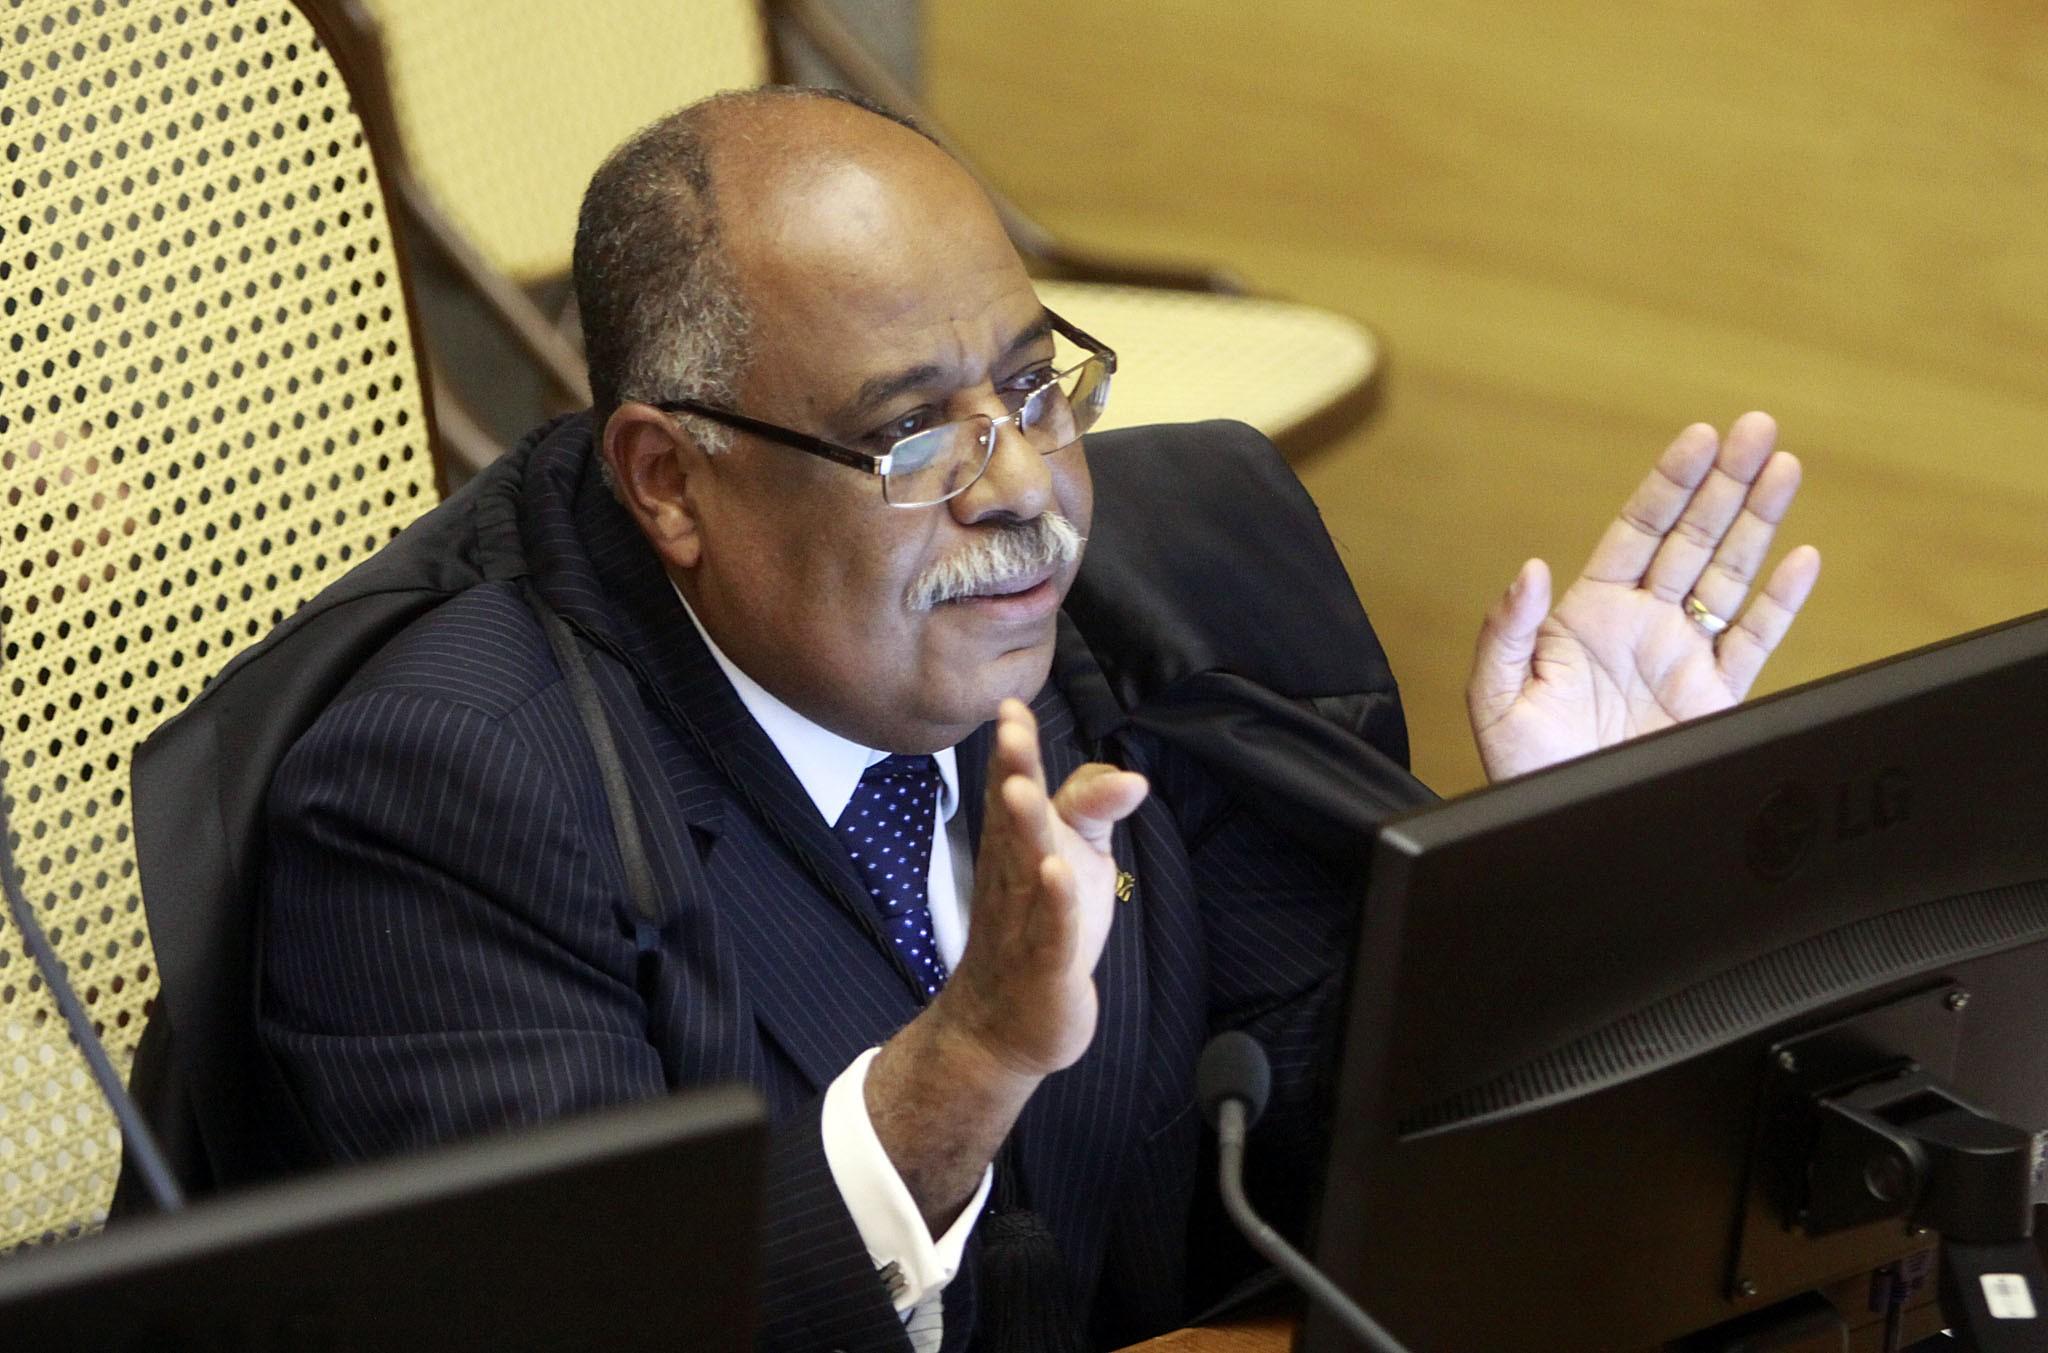 Ministro Benedito Gonçalves contrai Covid-19, informa assessoria do STJ